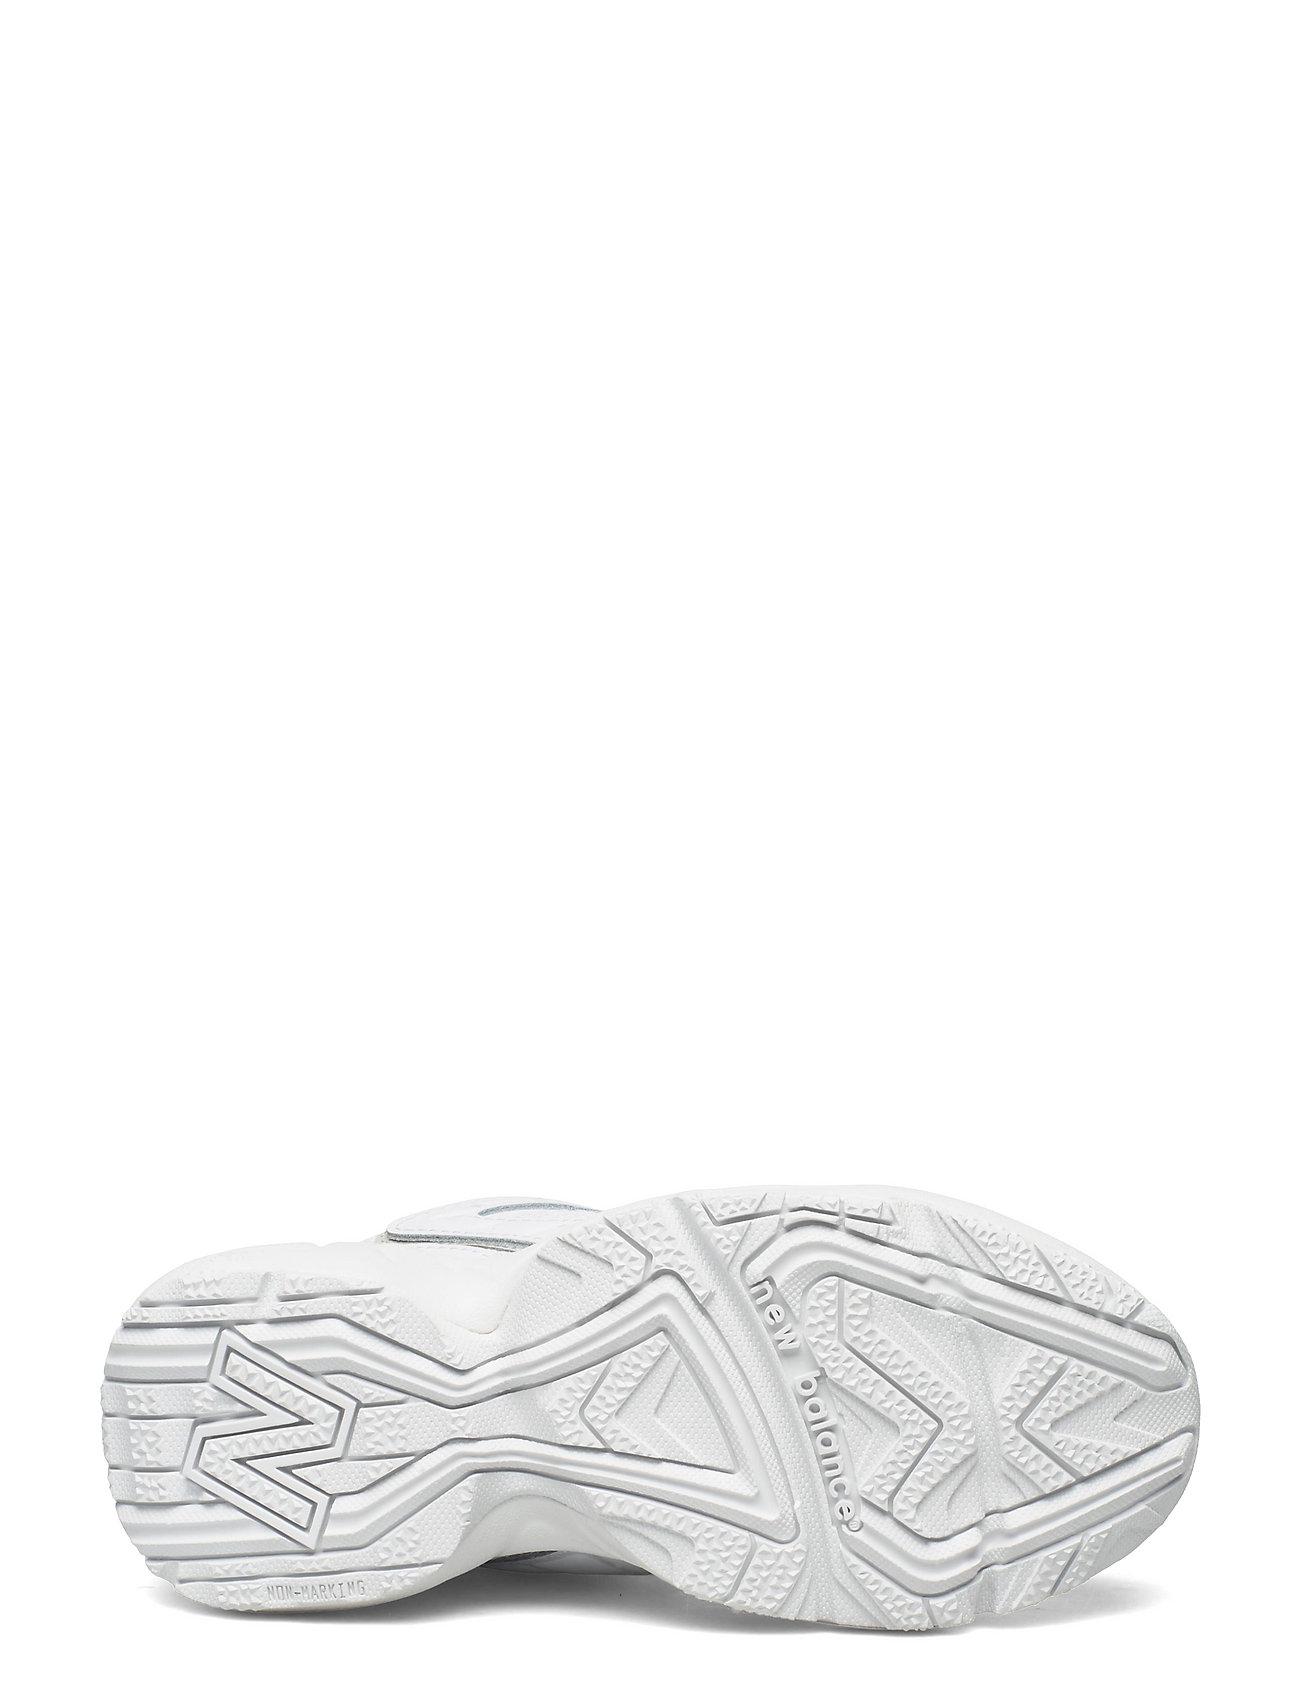 New Balance - WX452SG - white/grey - 9